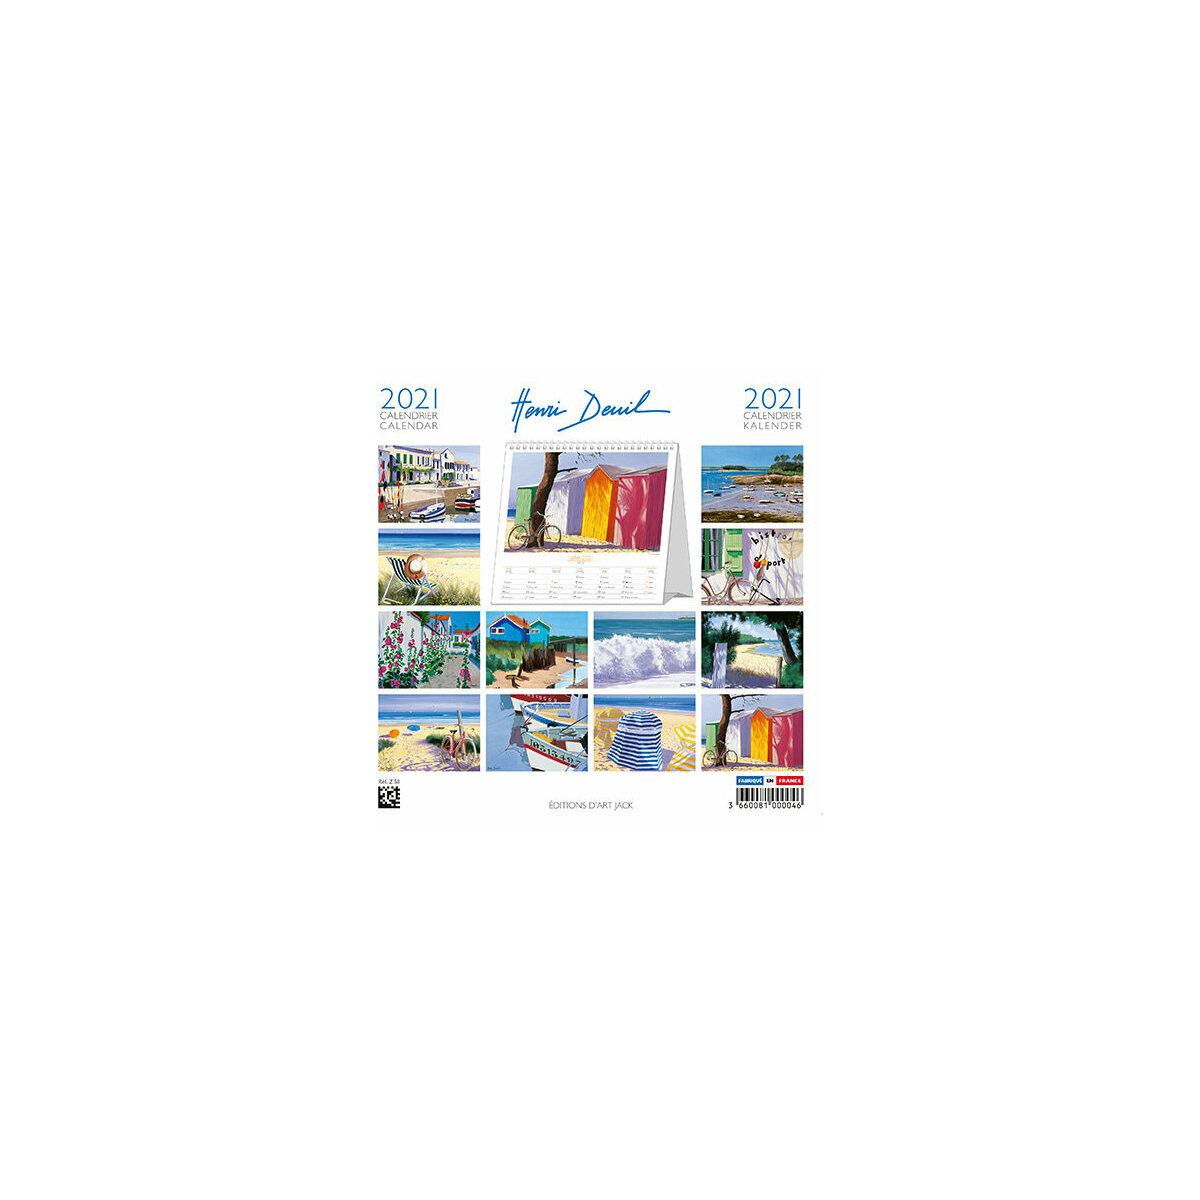 Calendrier Chevalet 2021 Calendrier chevalet 2021 Henri Deuil